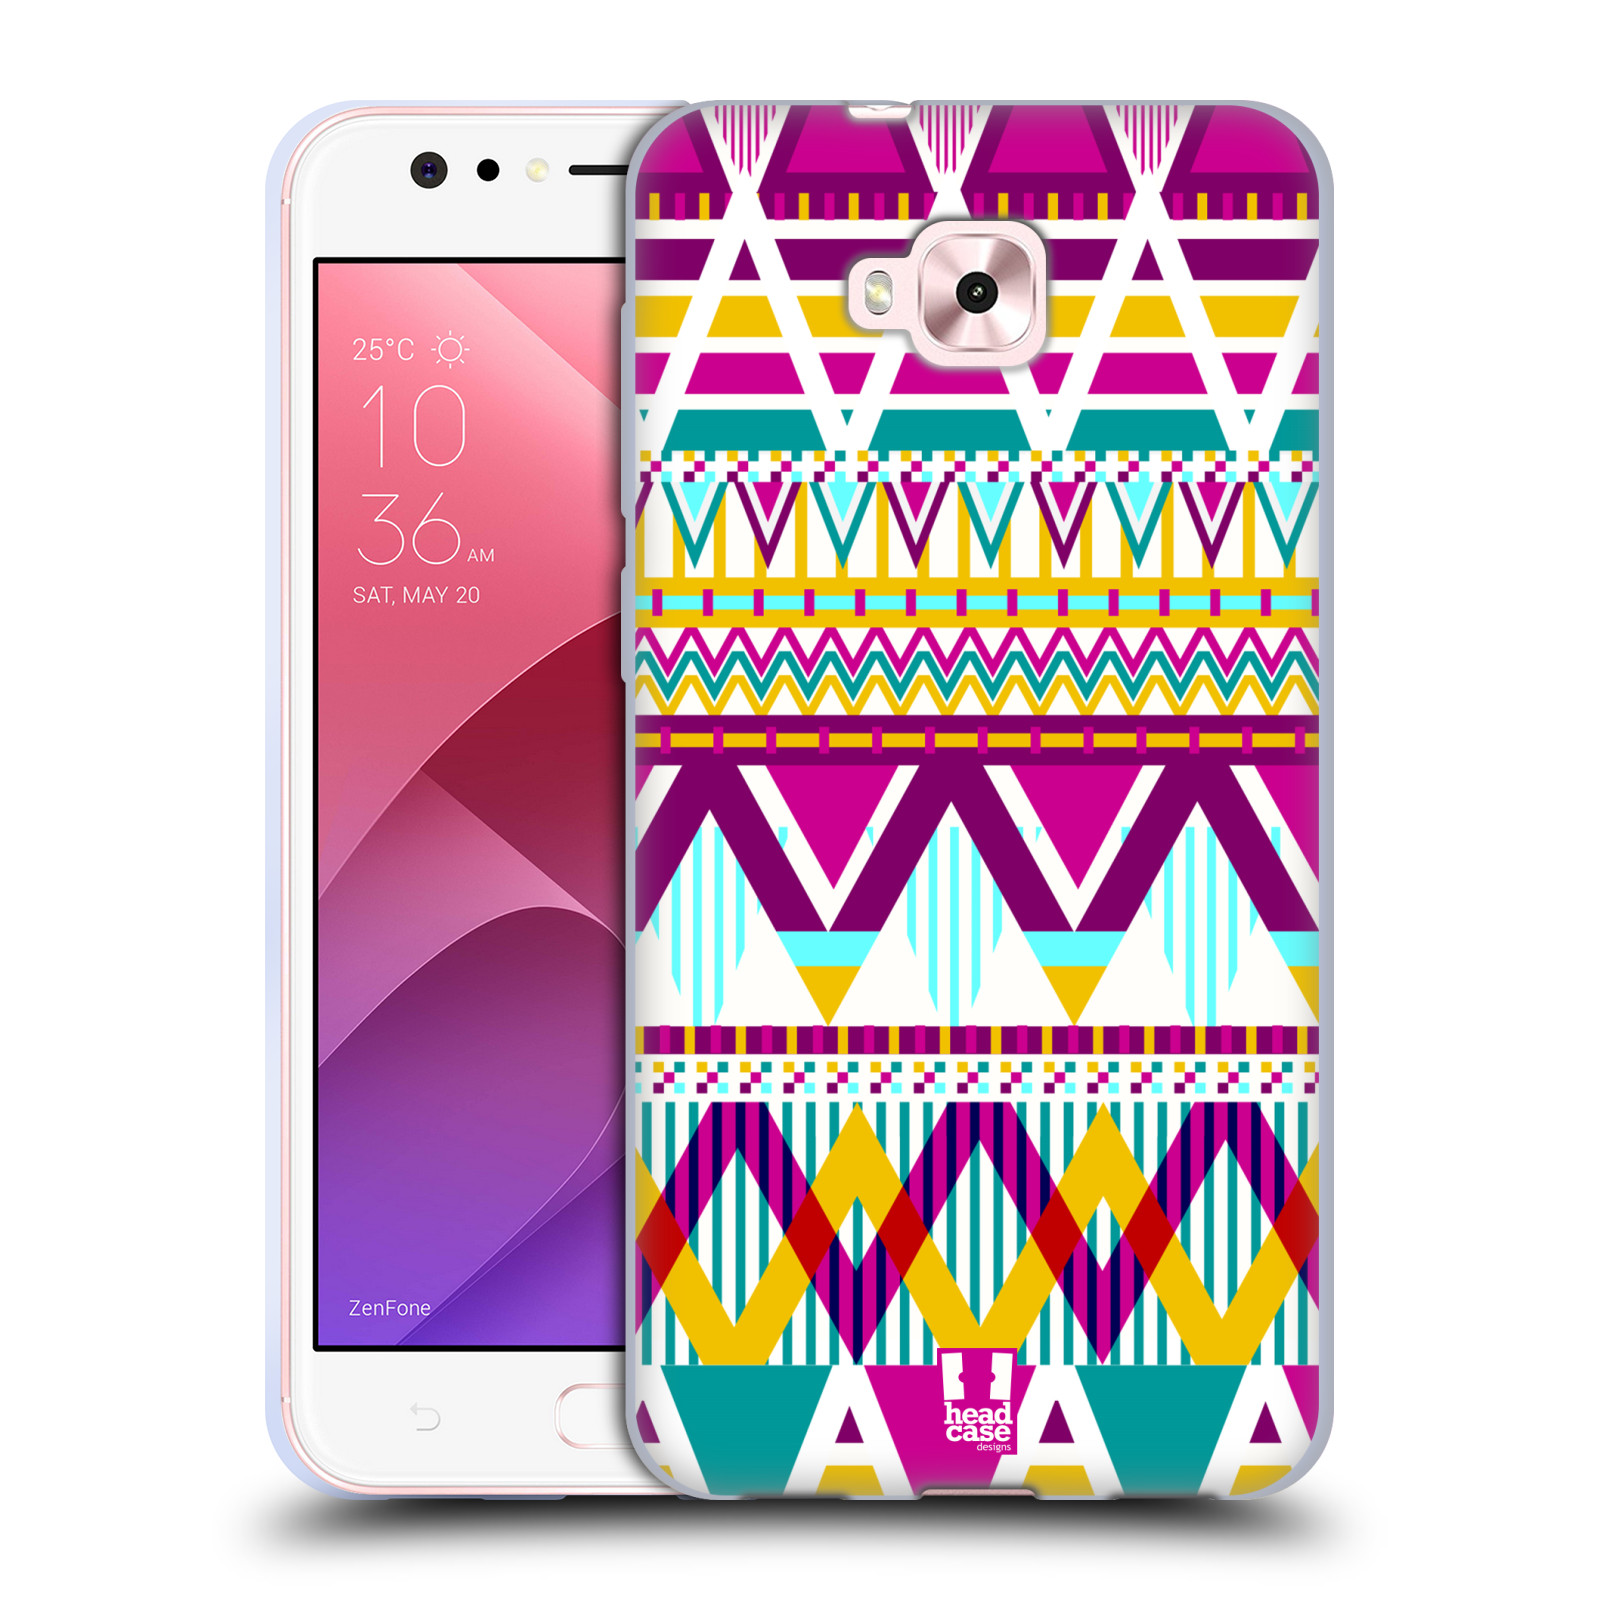 Silikonové pouzdro na mobil Asus Zenfone 4 Selfie ZD553KL - Head Case - AZTEC SUGARED